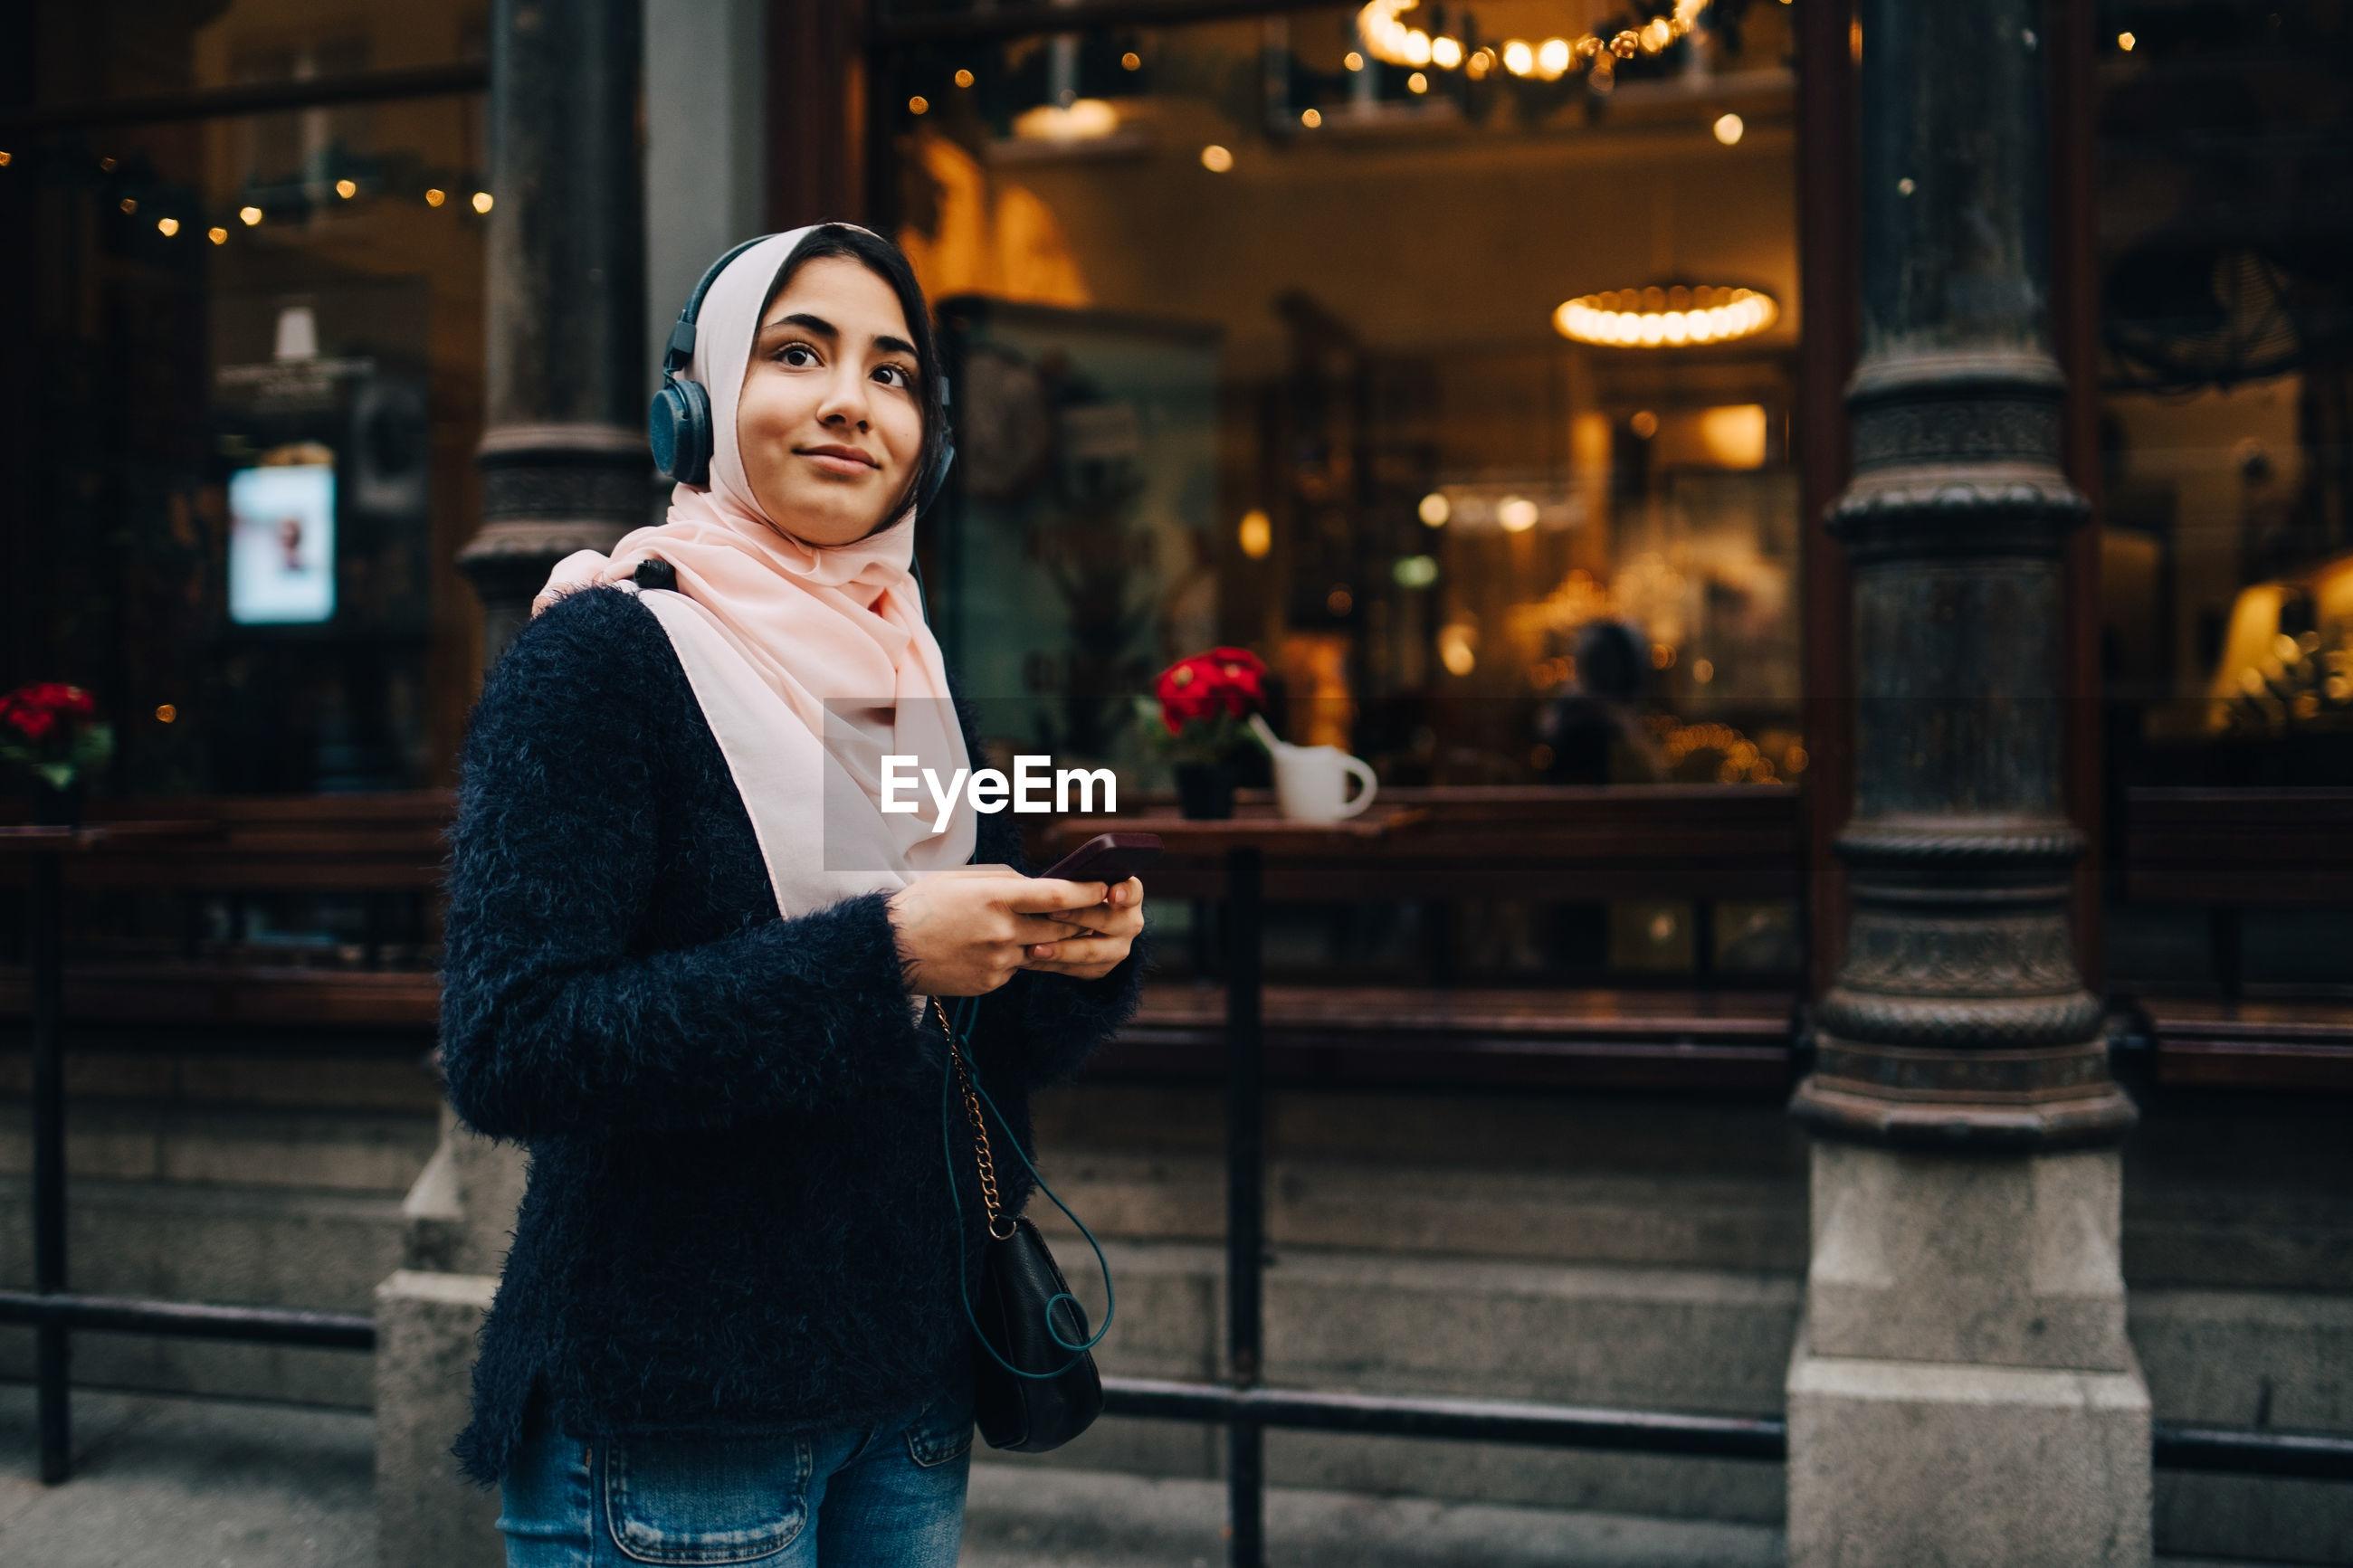 Teenage girl listening to headphones holding smart phone while looking away in city